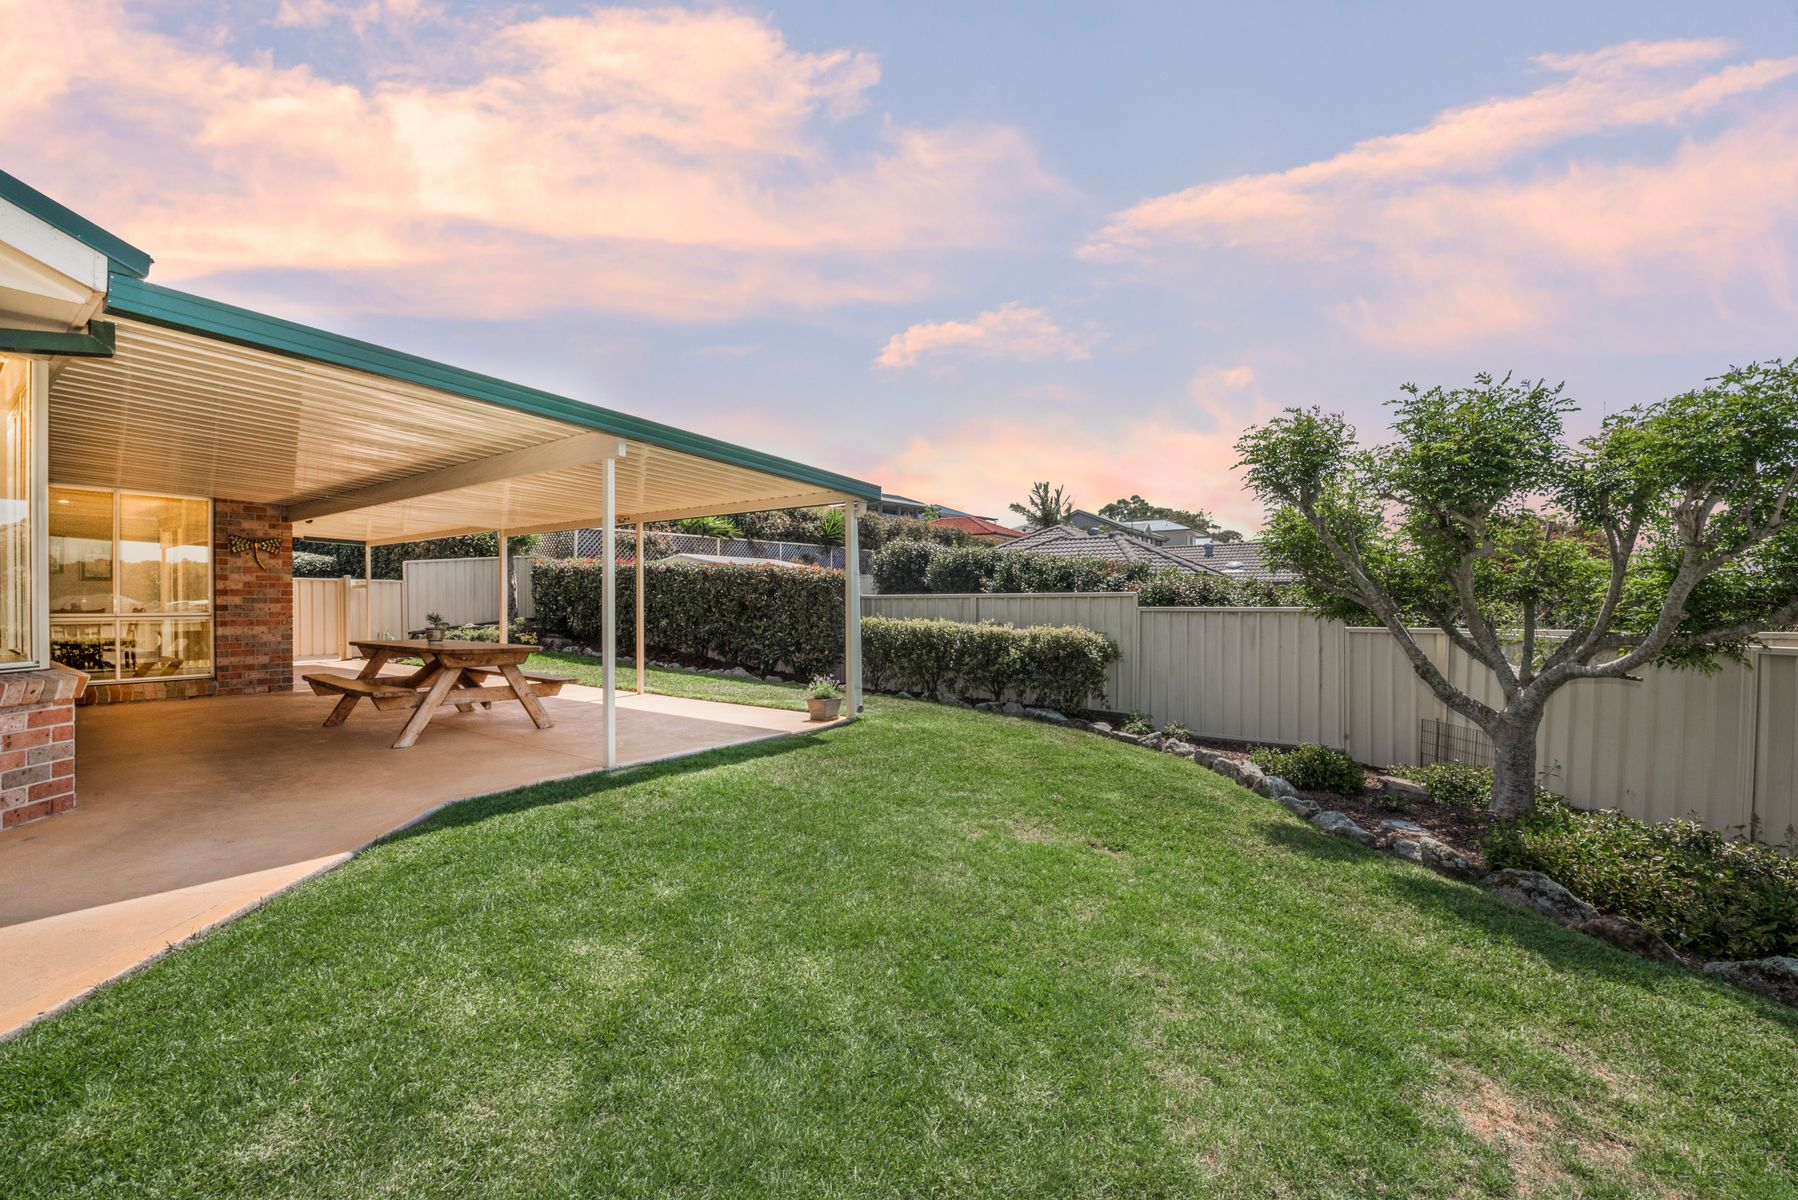 6 Morinda Ct, Valentine NSW 2280, Australia , House for Sale